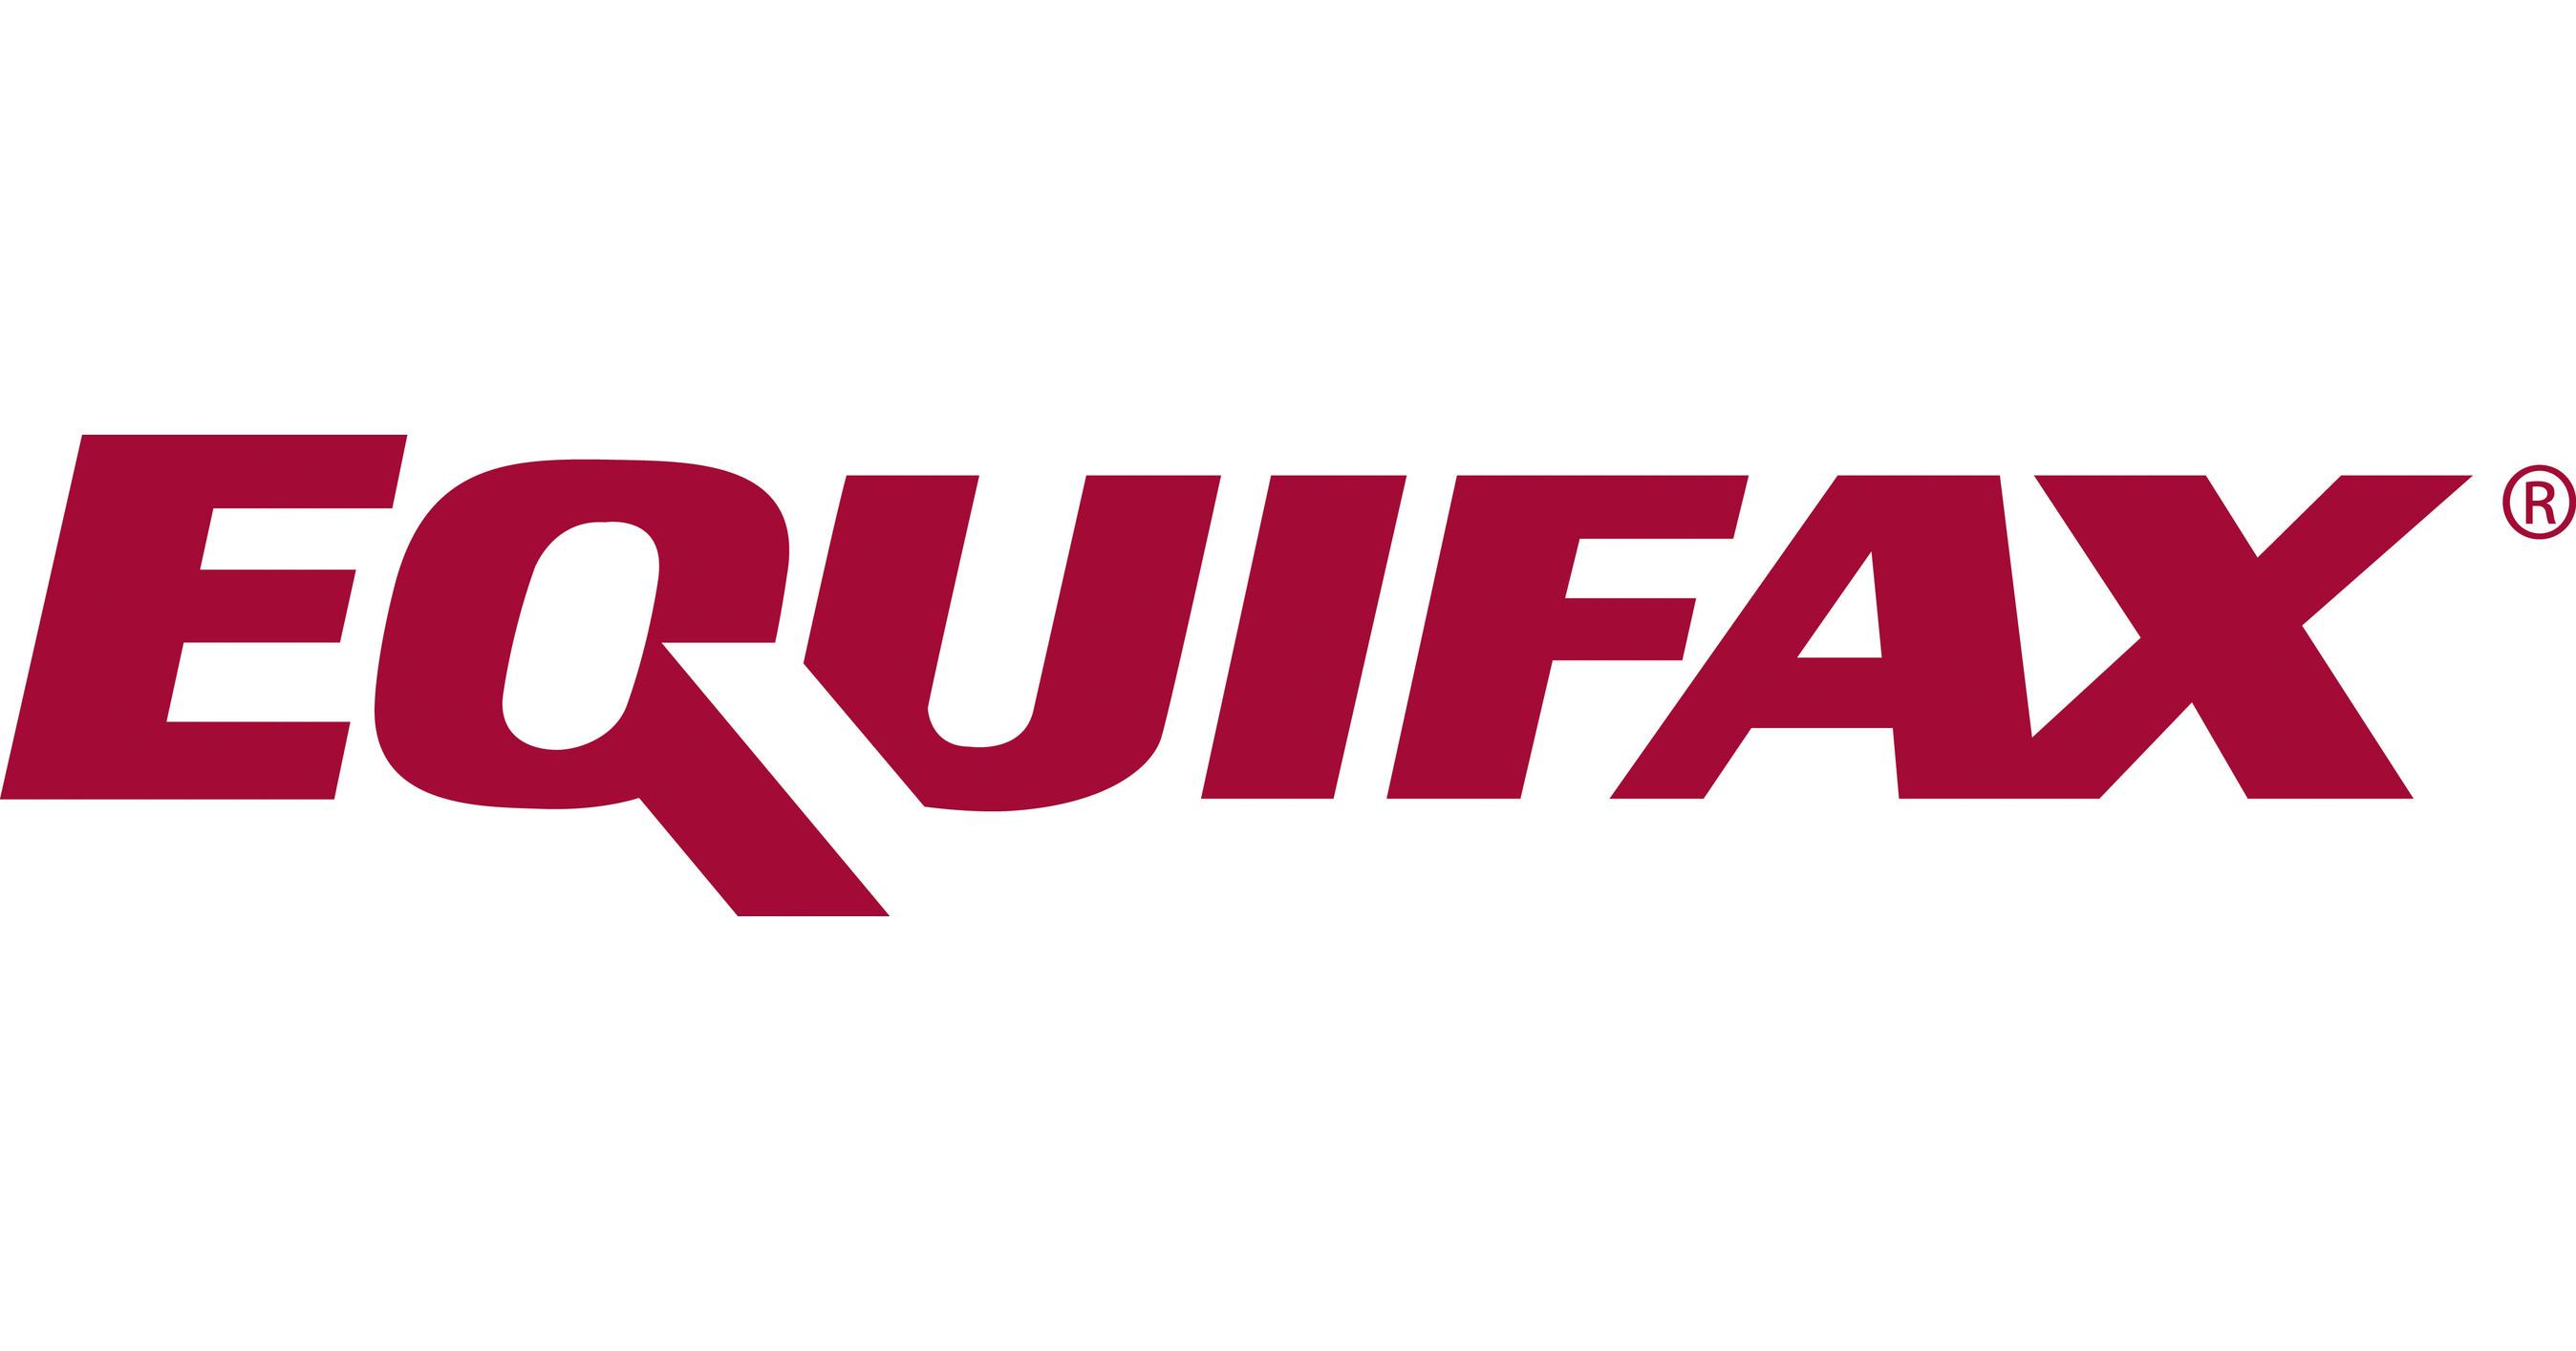 Equifax jpg Logo jpg?p=facebook.